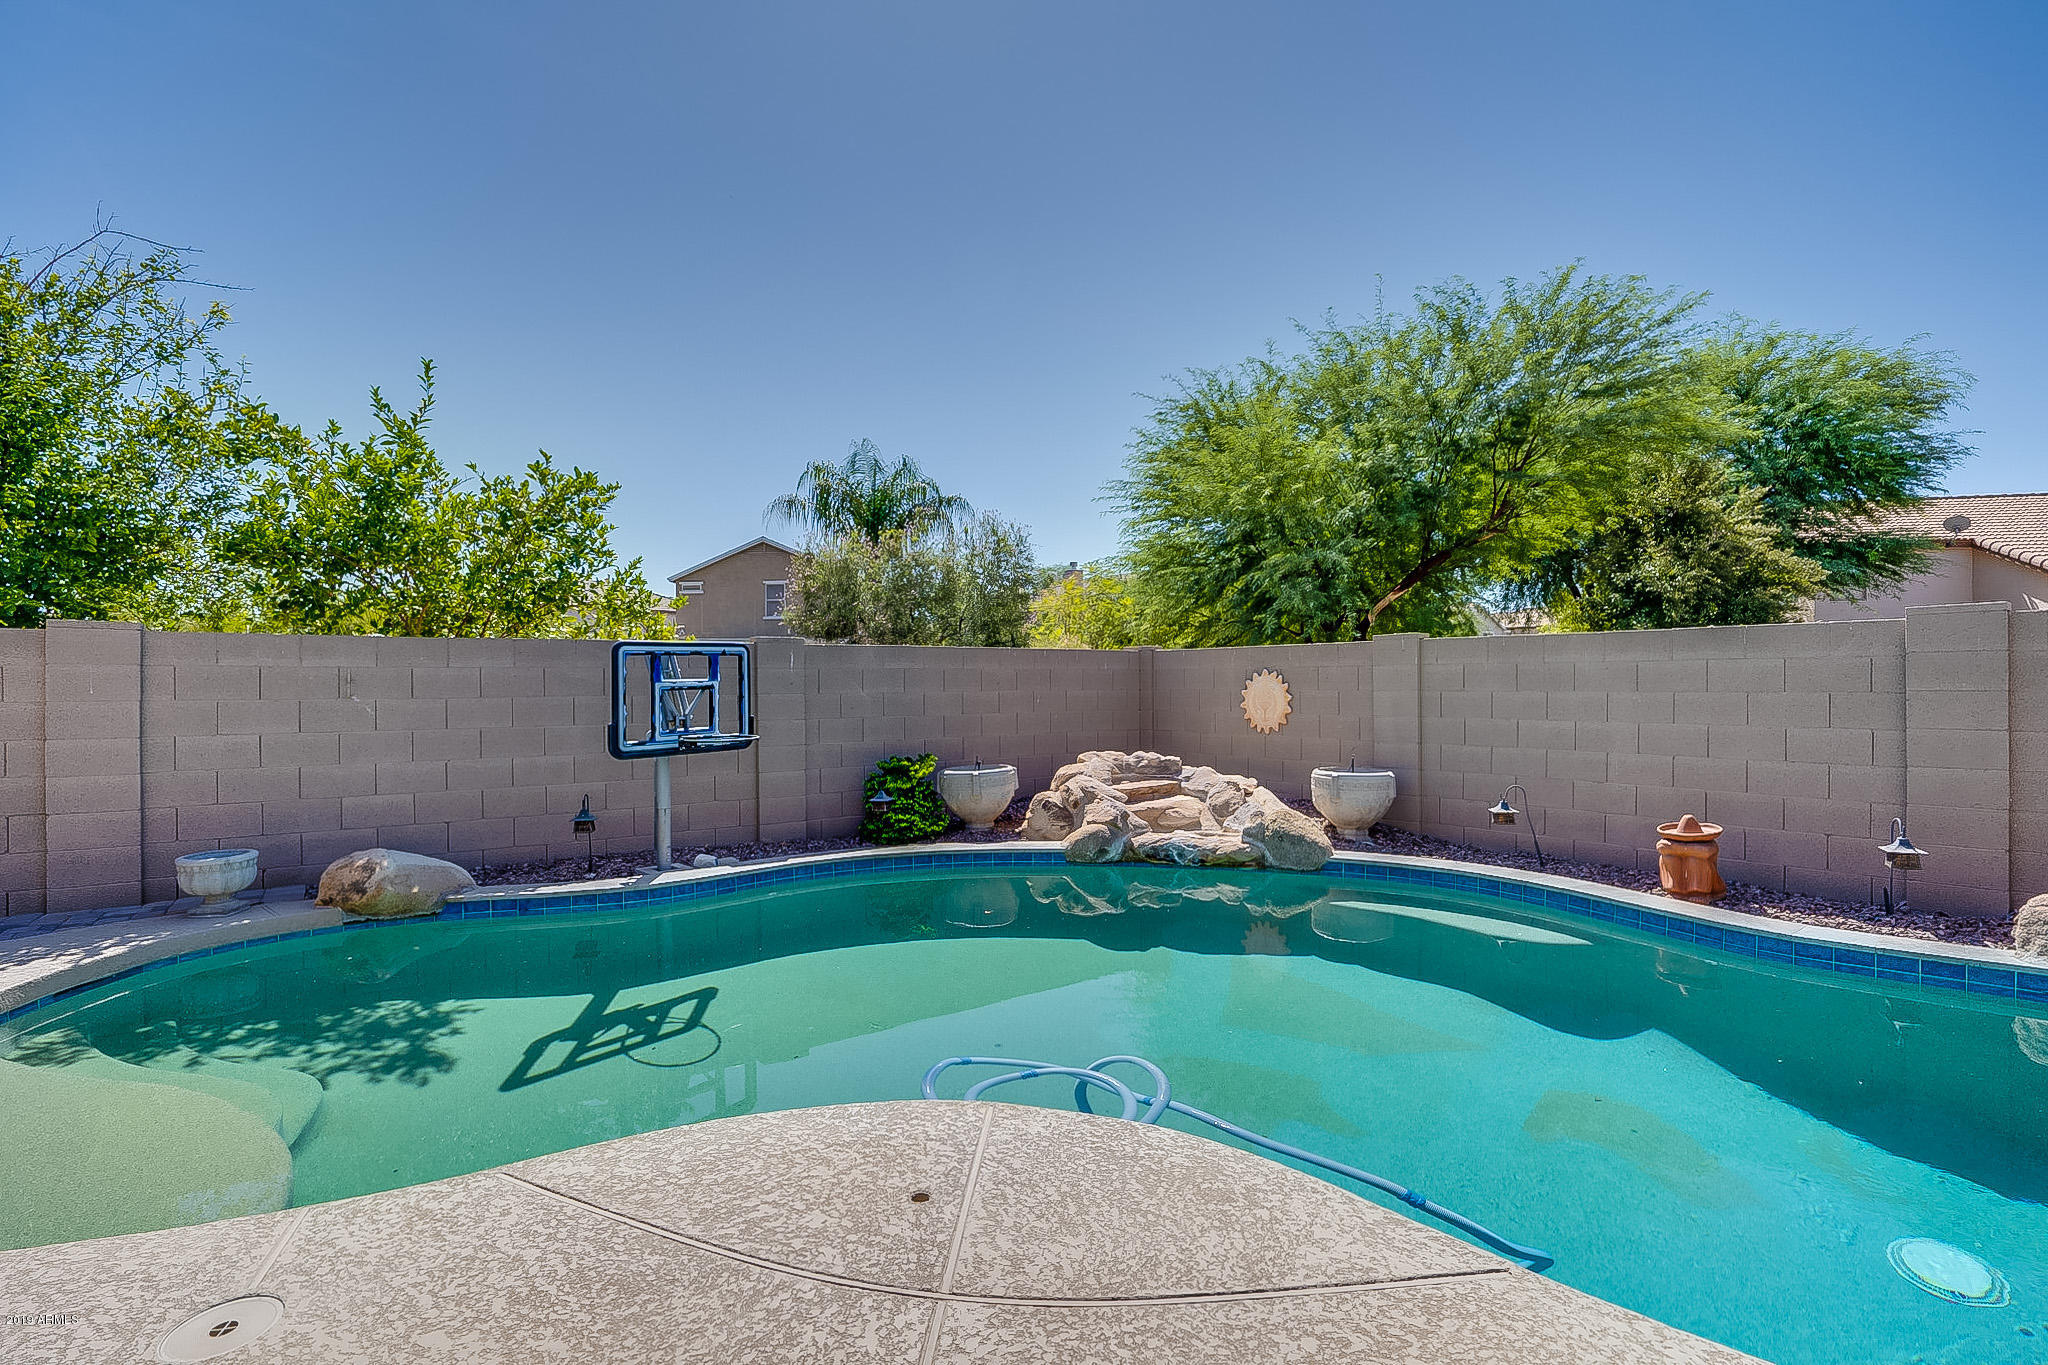 MLS 5968952 13507 W Peck Drive, Litchfield Park, AZ 85340 Litchfield Park AZ Dreaming Summit